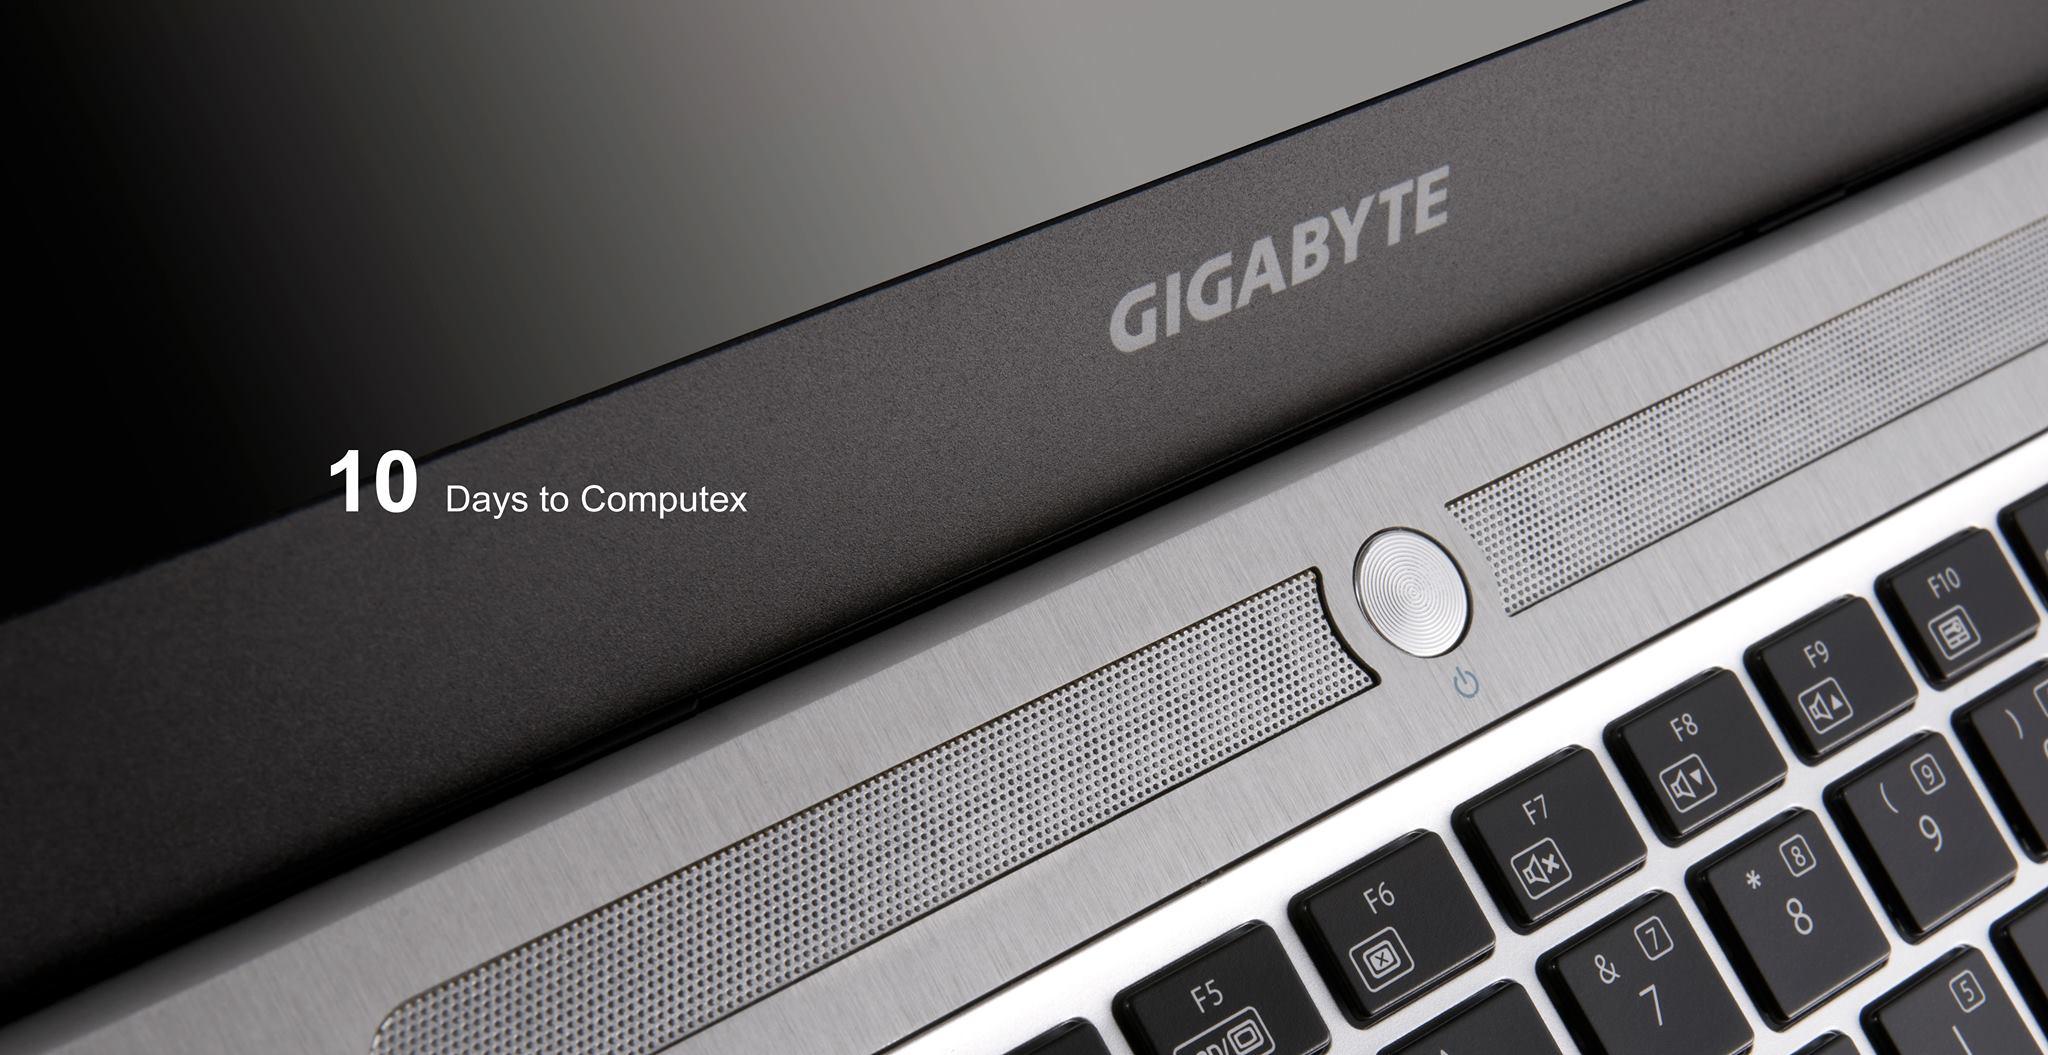 Gigabyte P34G Gaming-Notebook mit Ultrabook-Maßen angekündigt